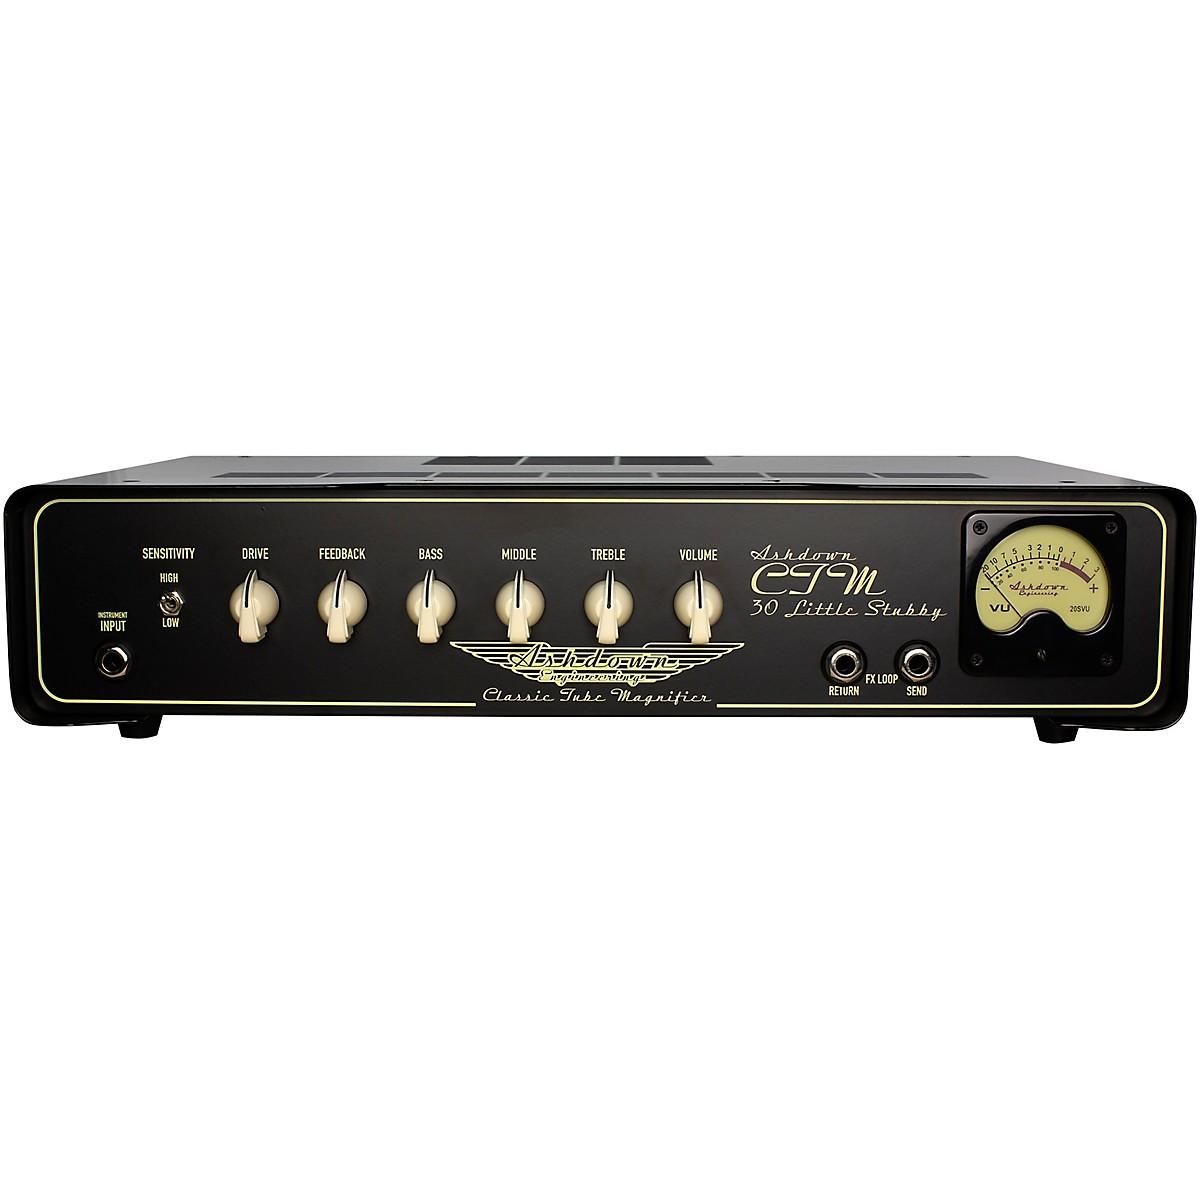 Ashdown CTM30 Little Stubby 30W Tube Bass Amp Head